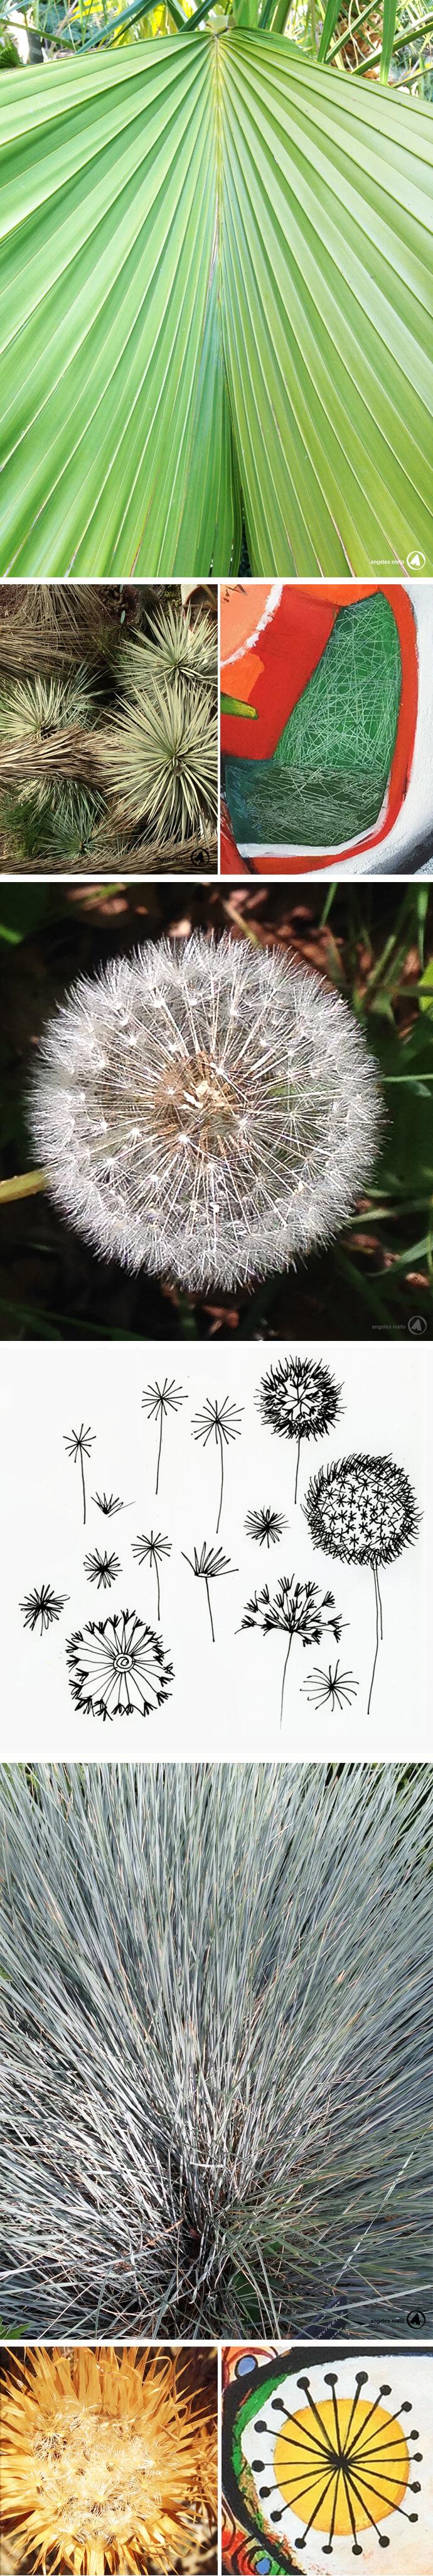 flores-estructura-a